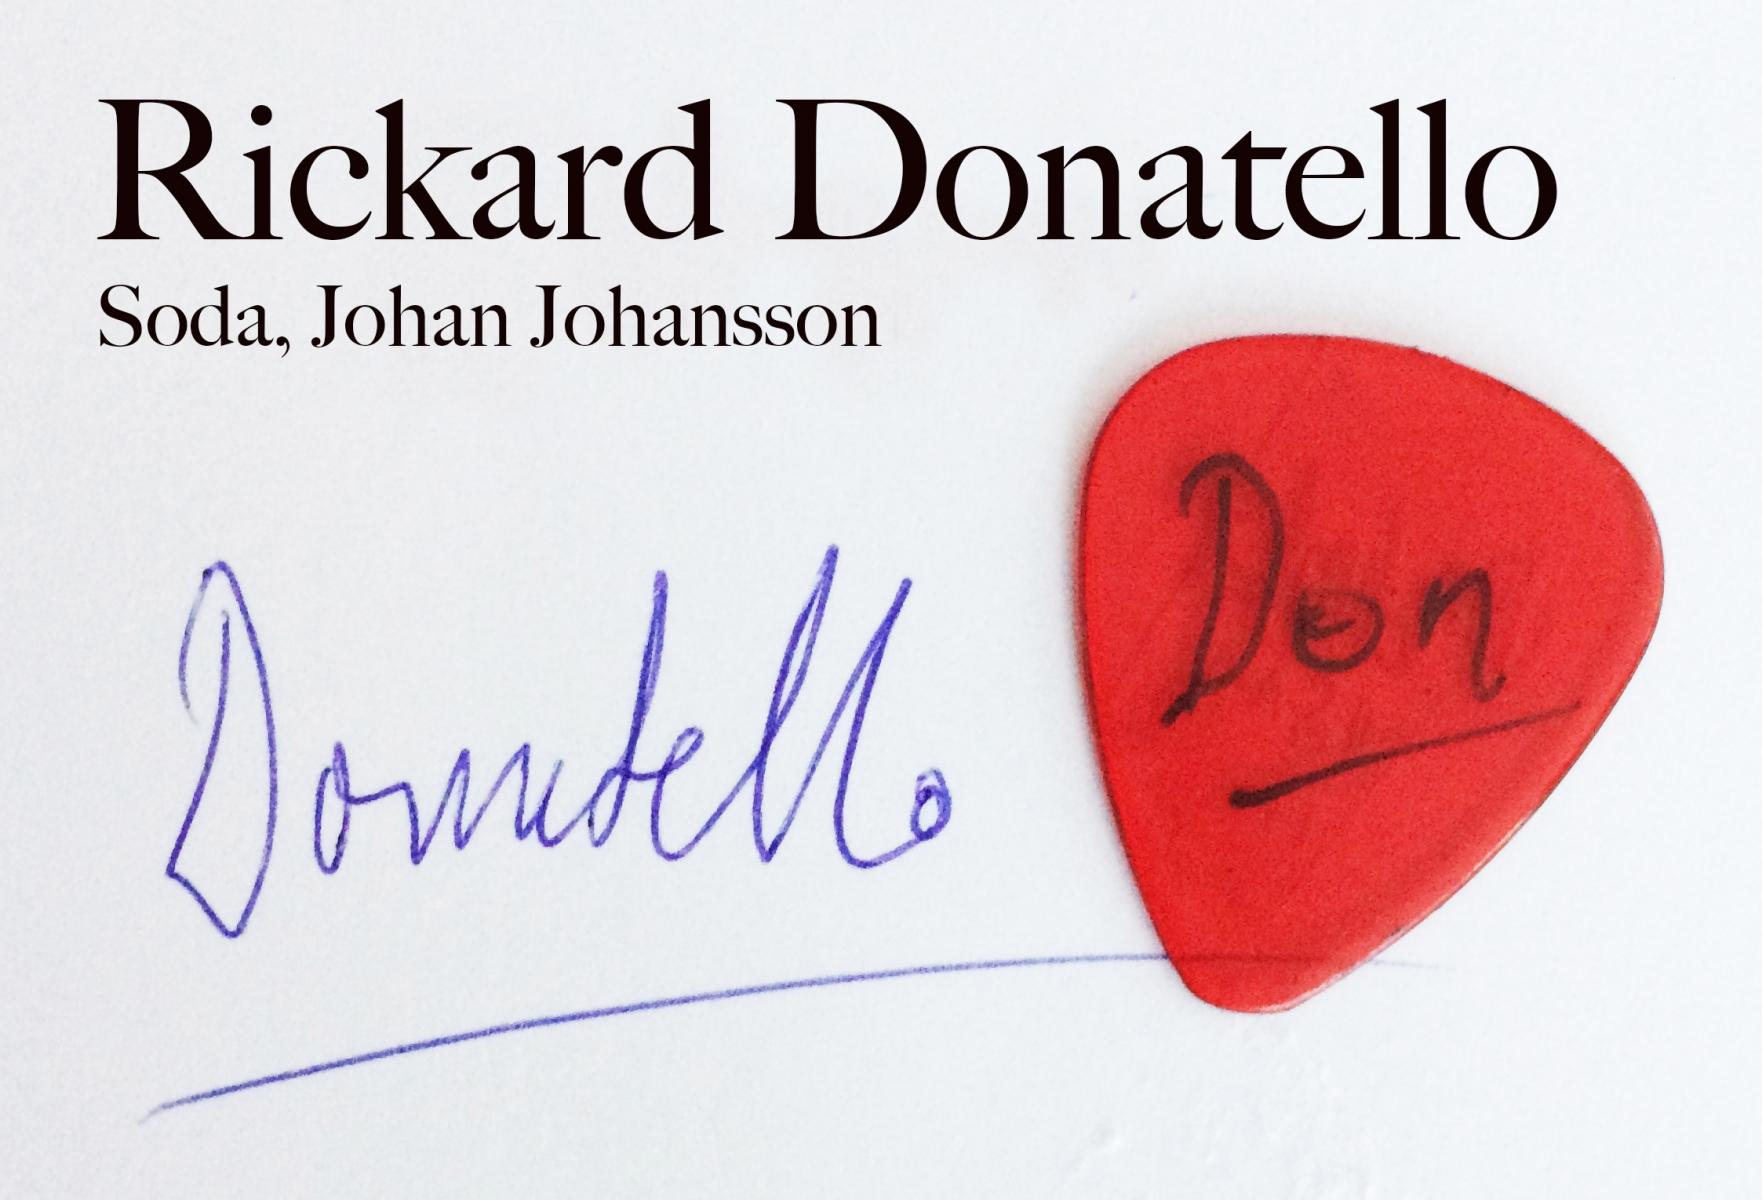 Rikard Donatello